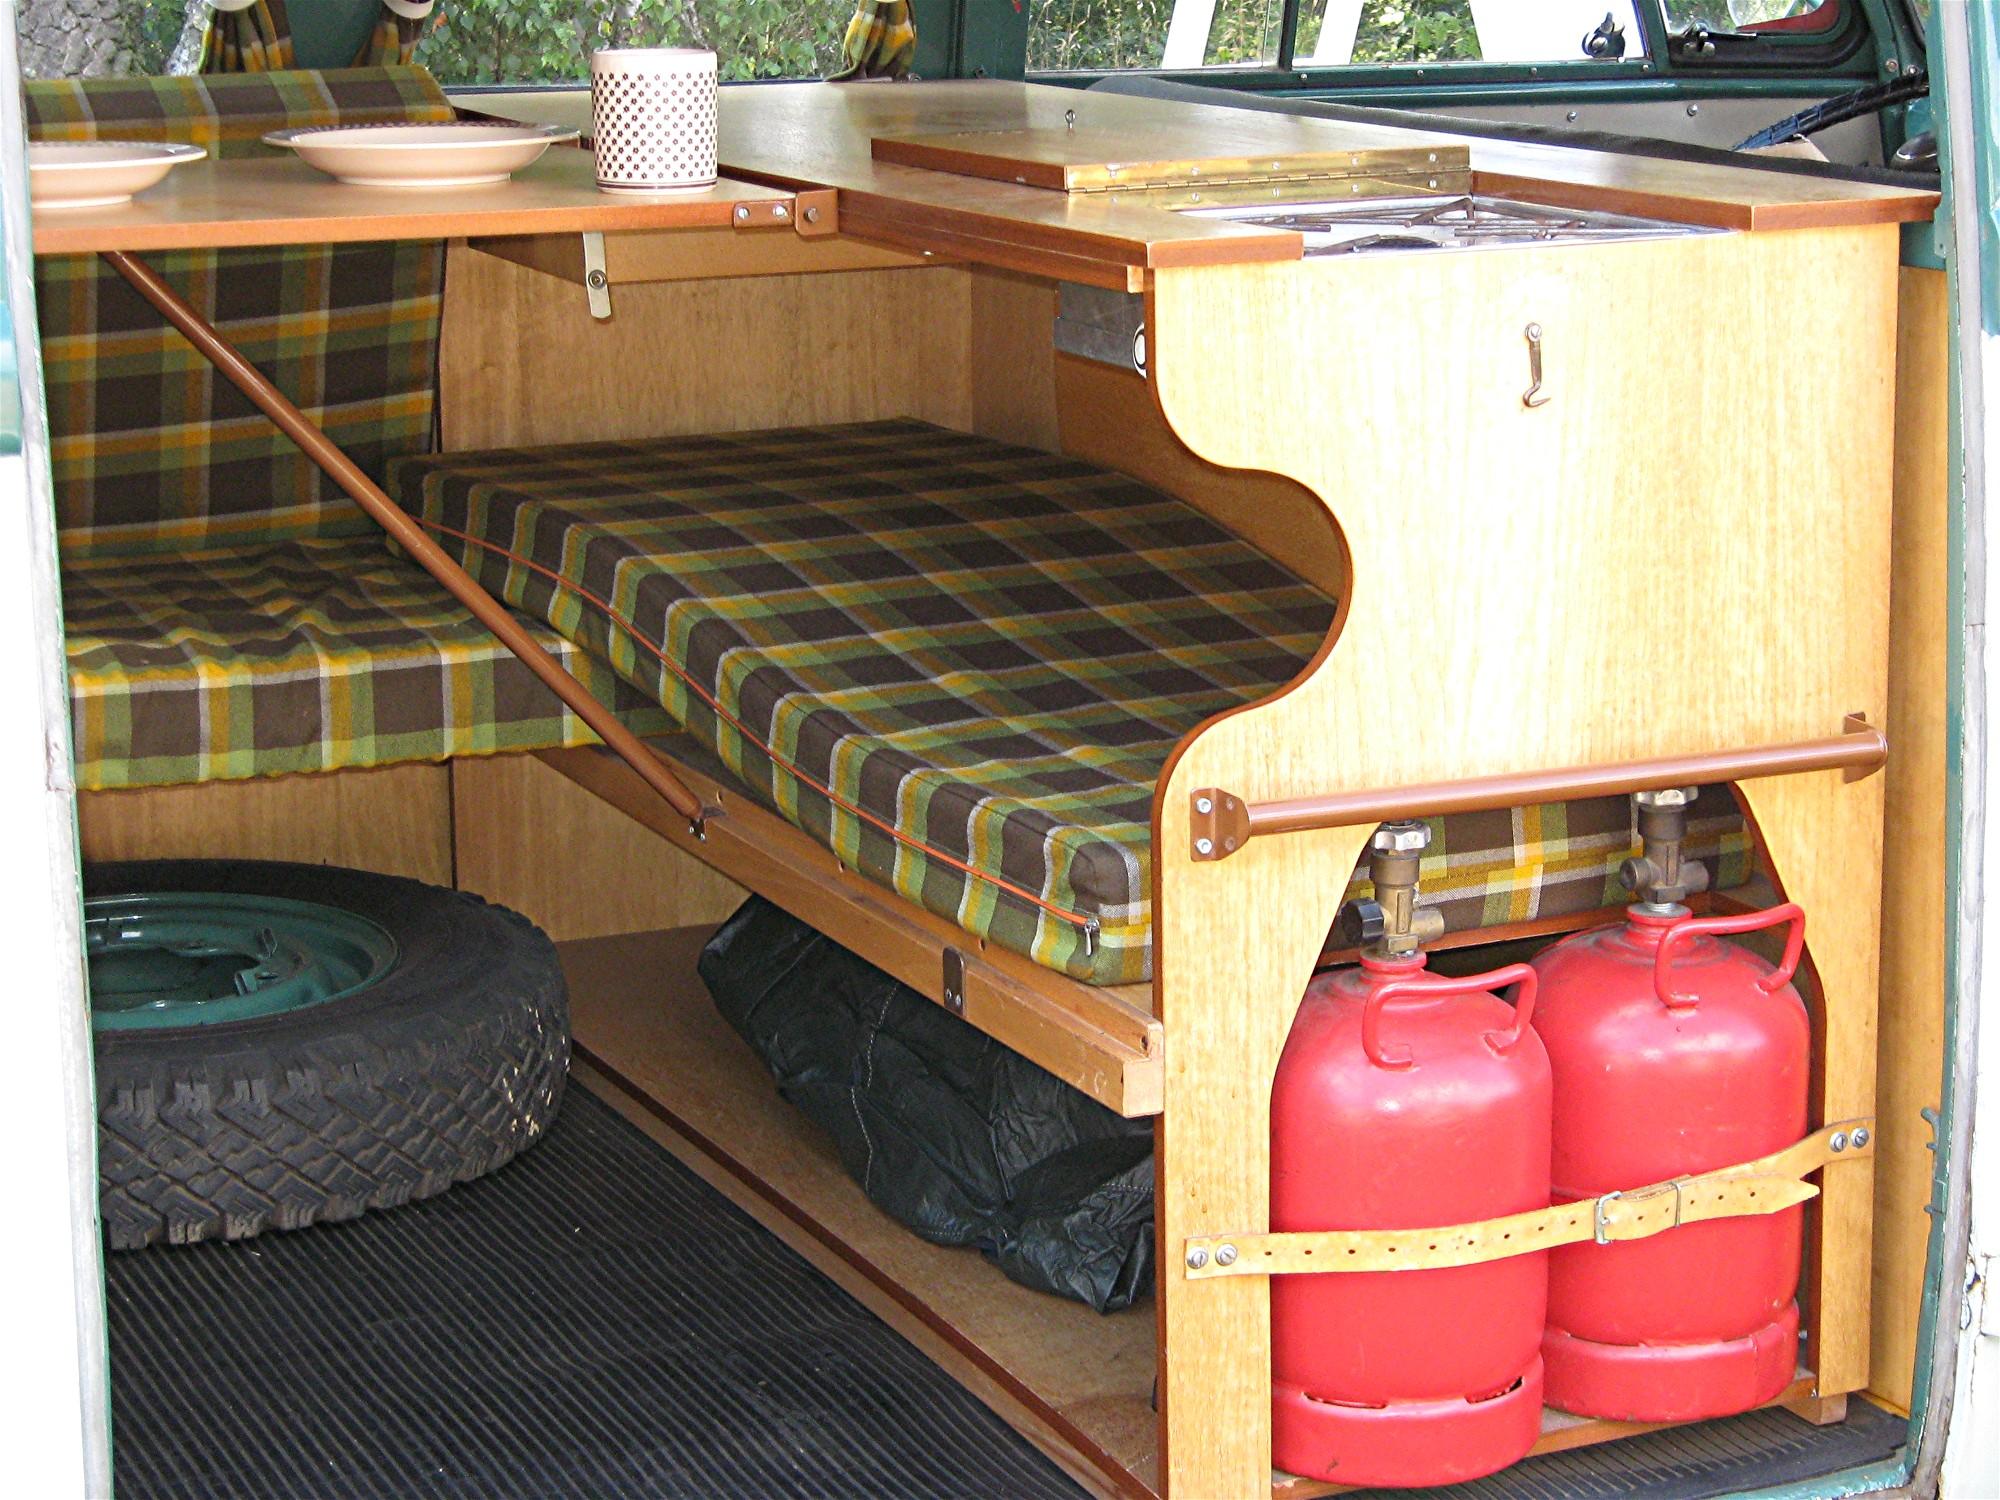 DIELECTRIC Campingbox Erfahrungen – Dielectric Campingbox